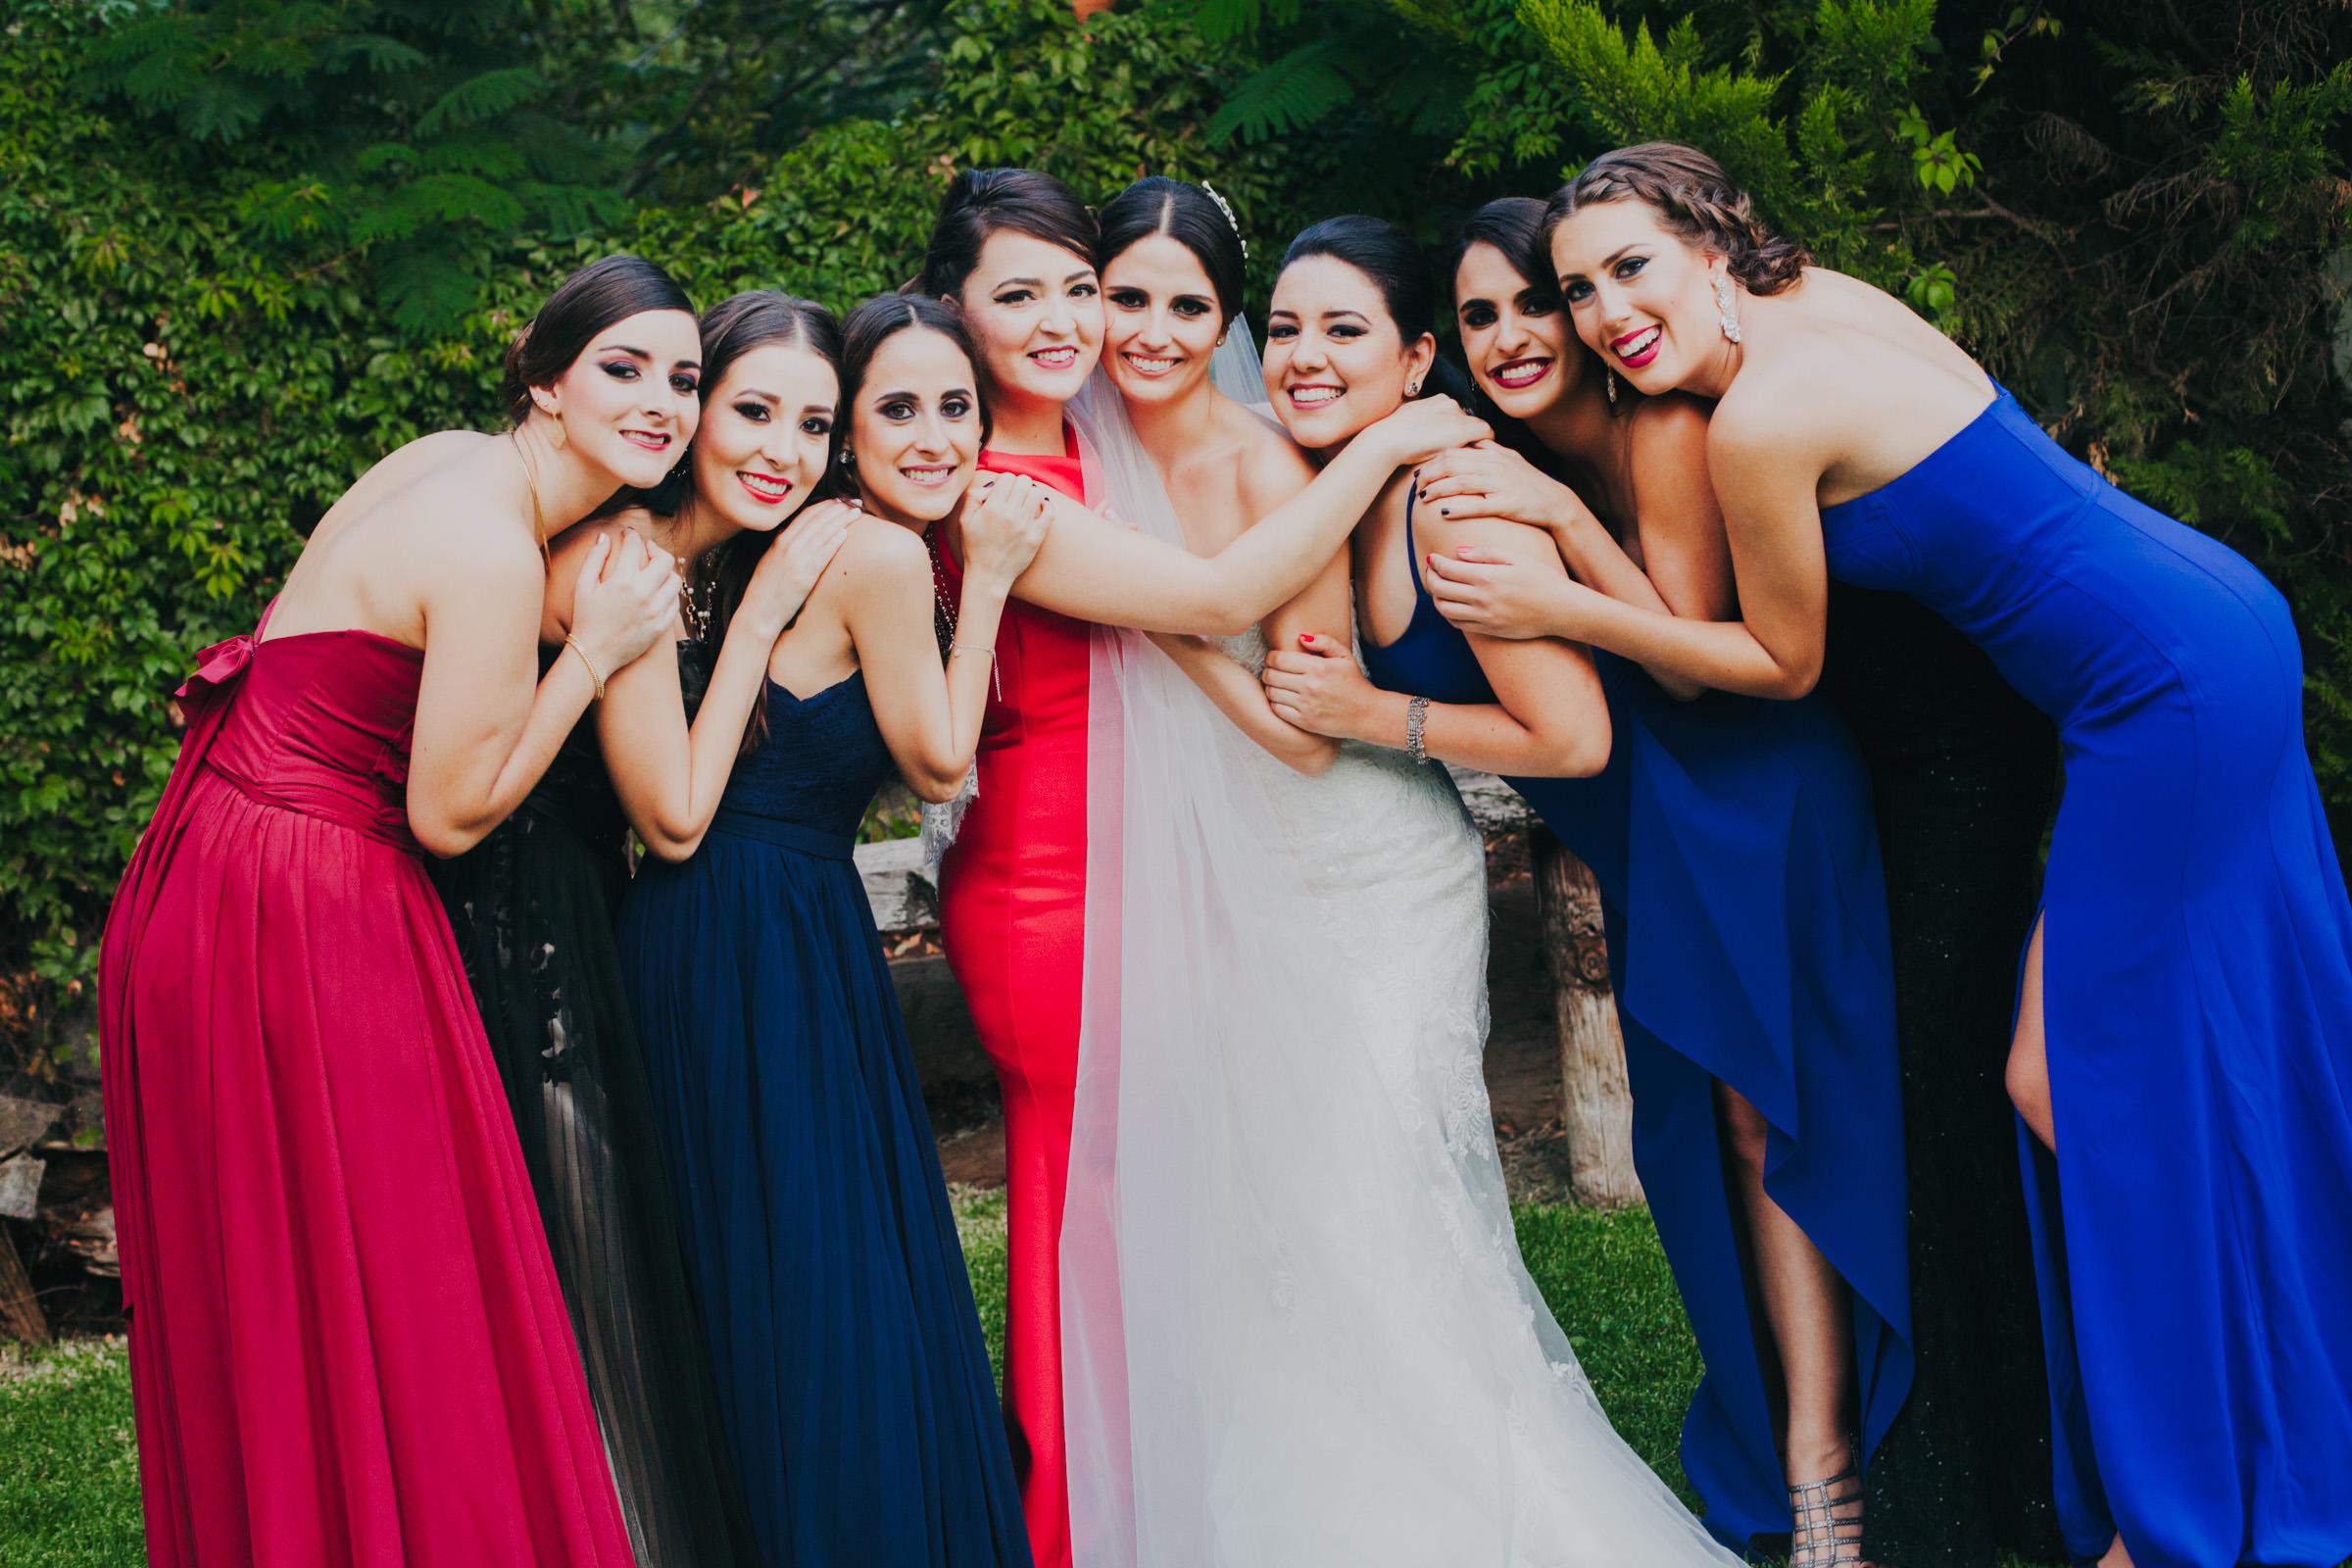 irapuato-boda-fotografia-jardines-alcalde-guanajuato-paulina-juan-pedro--98.jpg